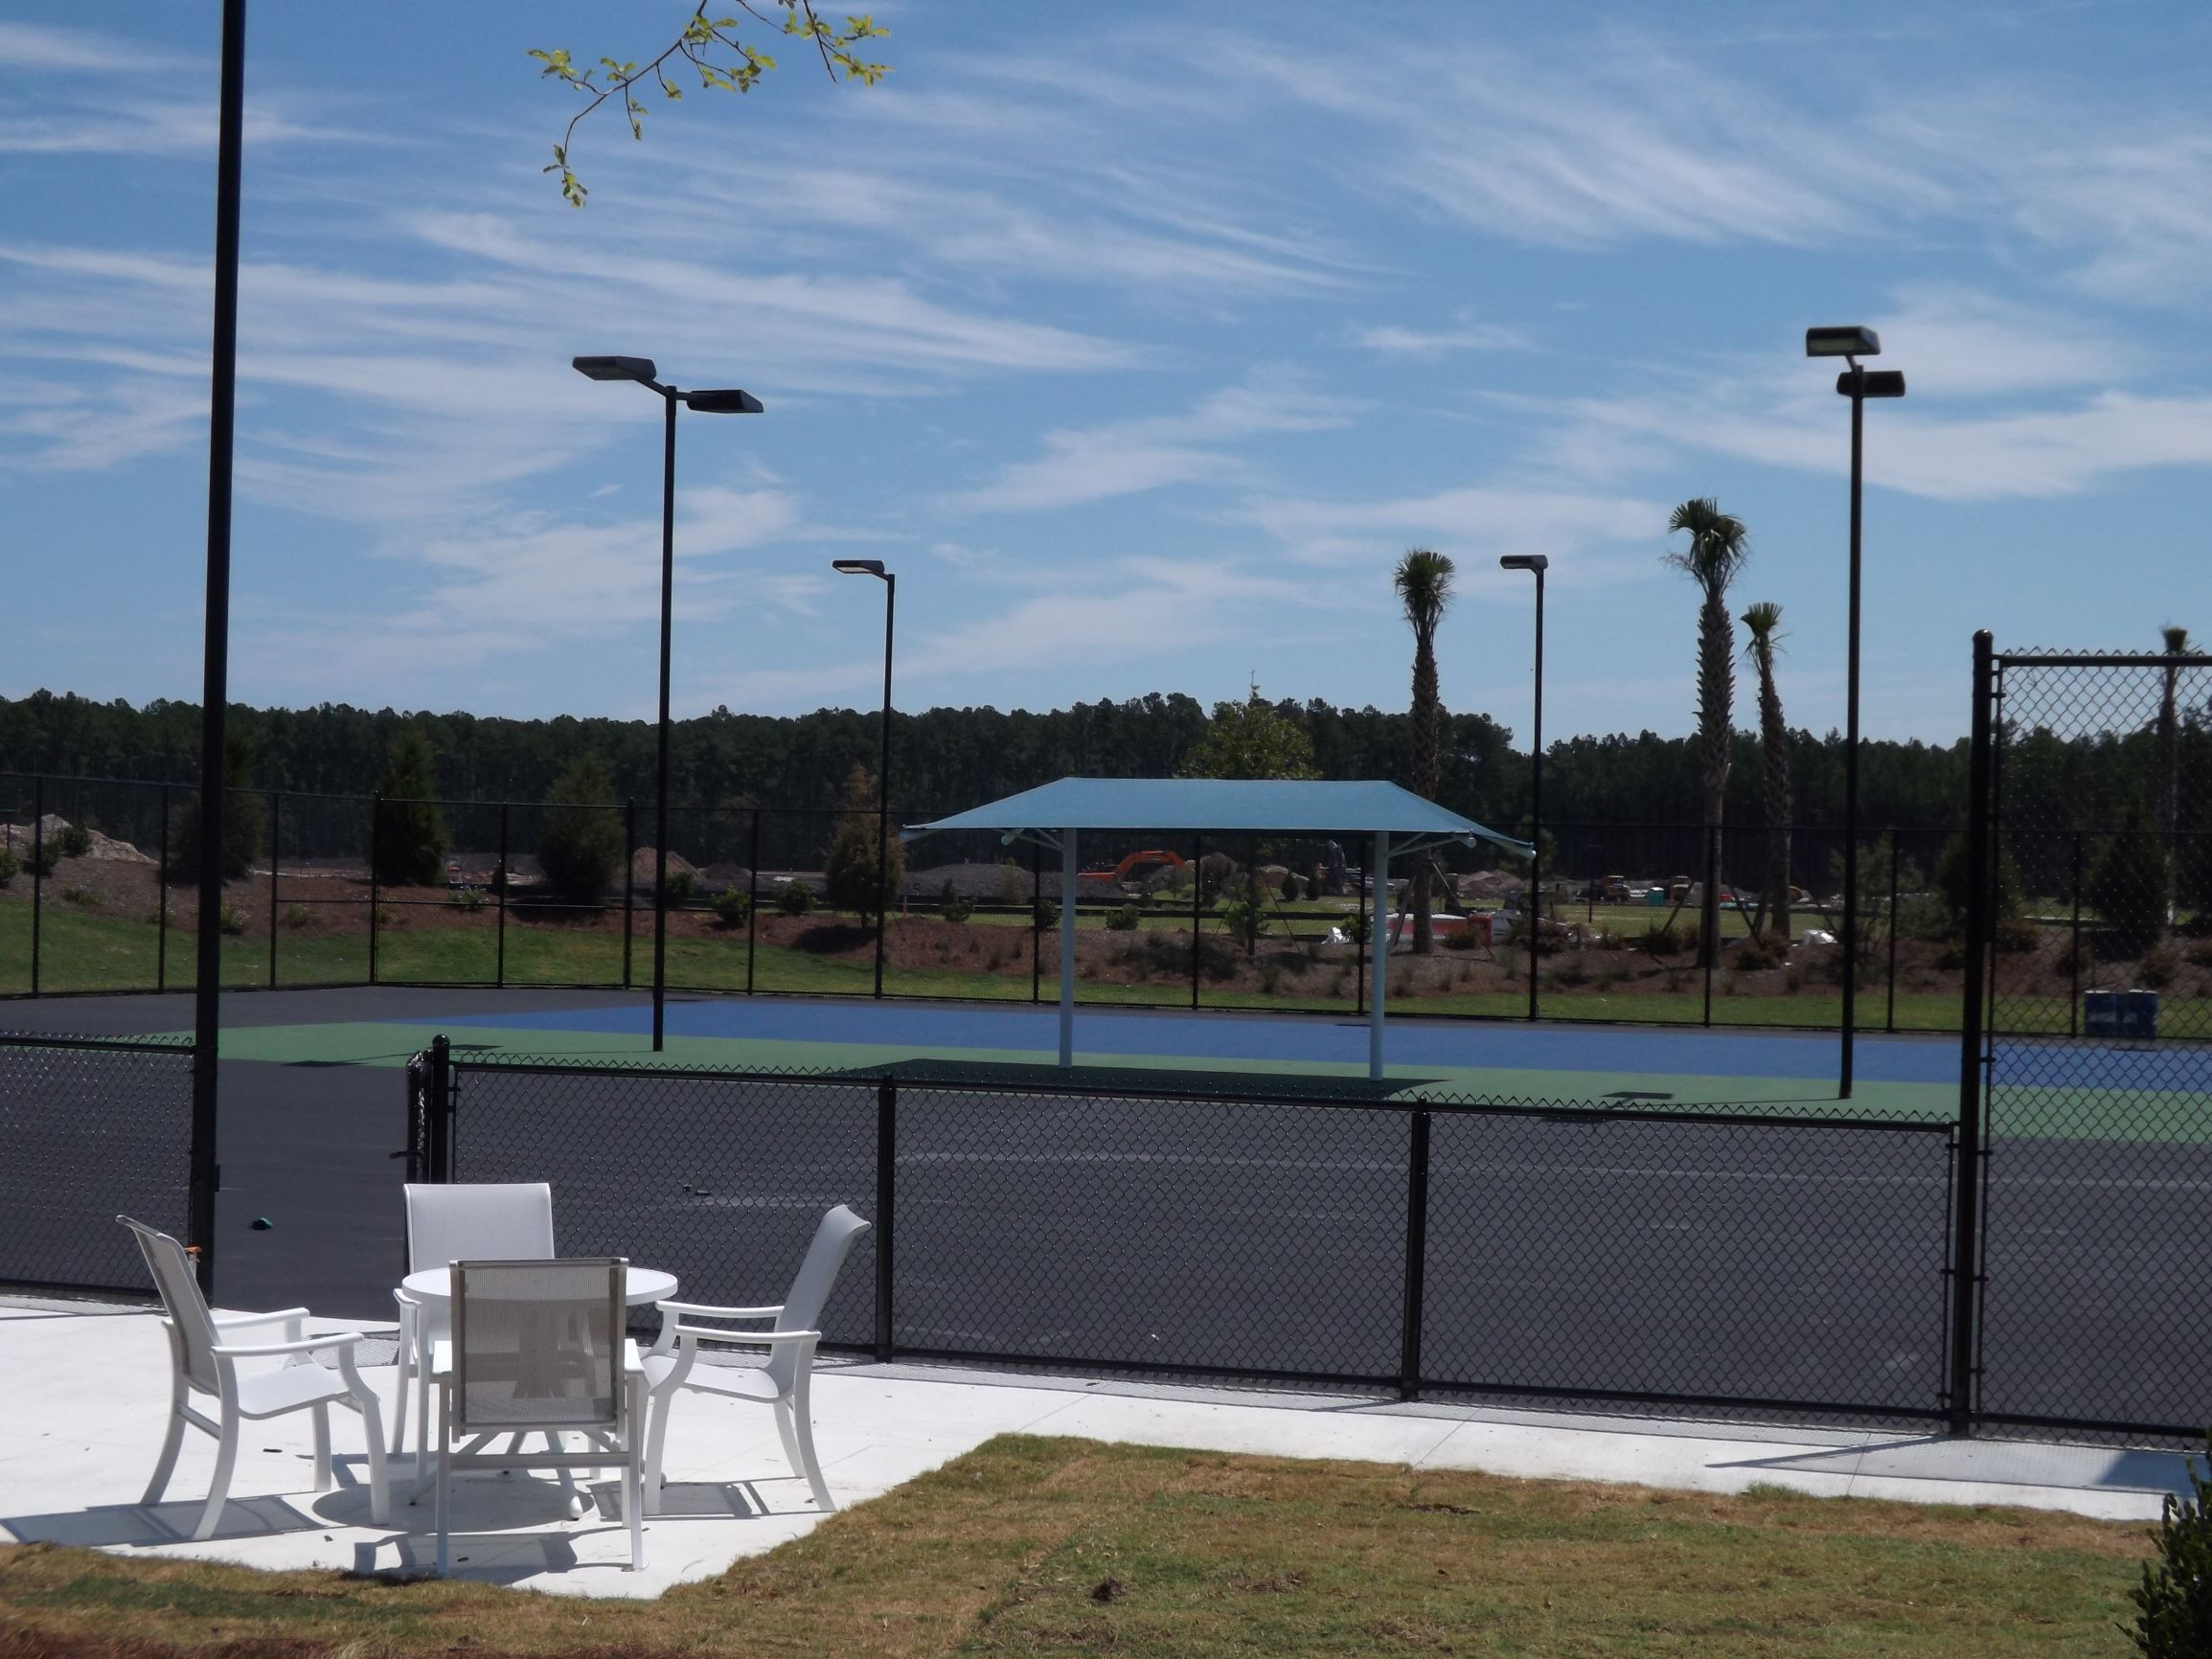 PickleBall Courts at Del Webb Nexton